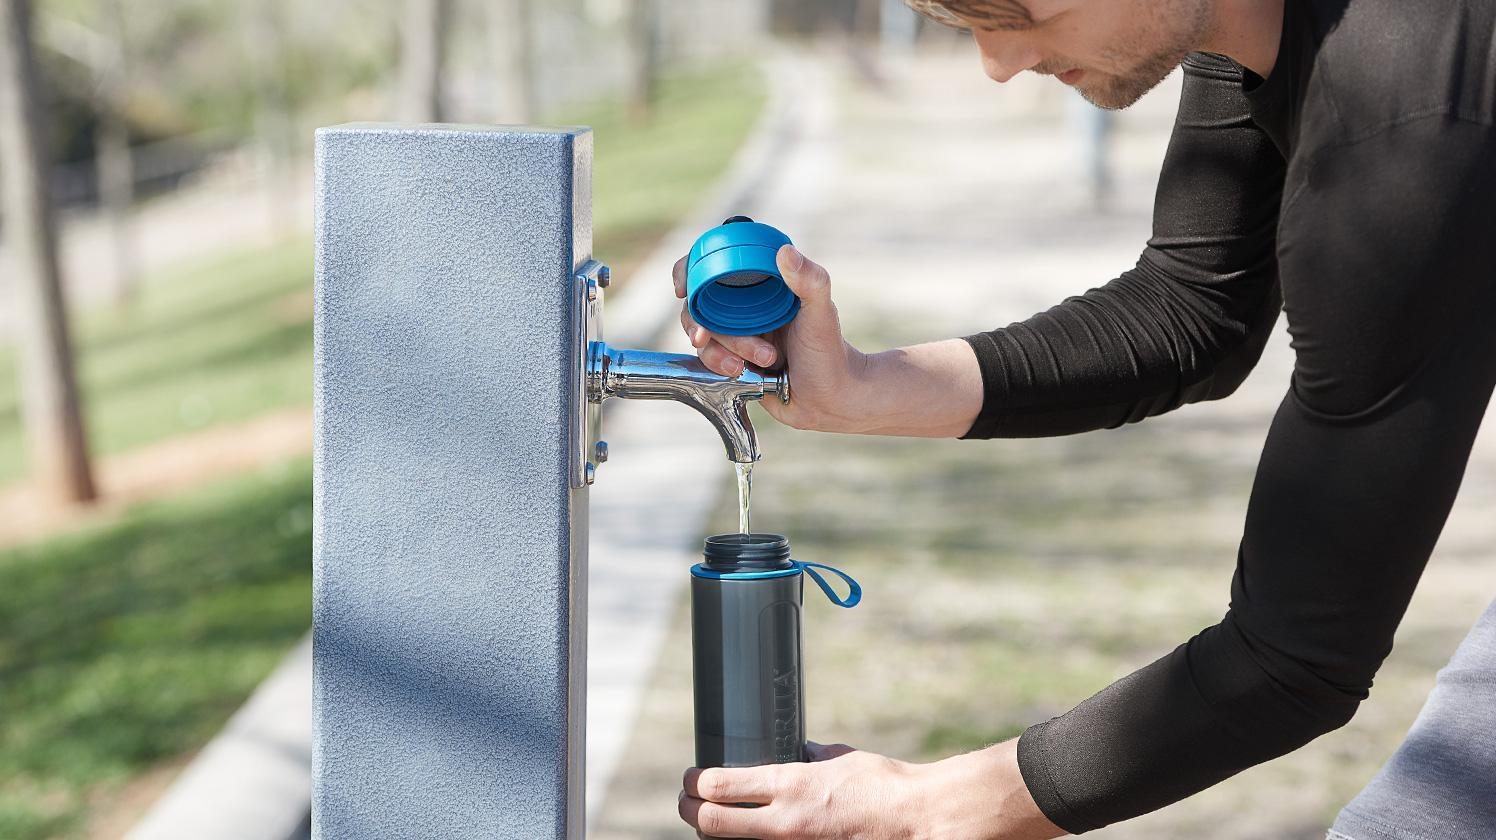 BRITA fill&go Active blue guy refill outdoor